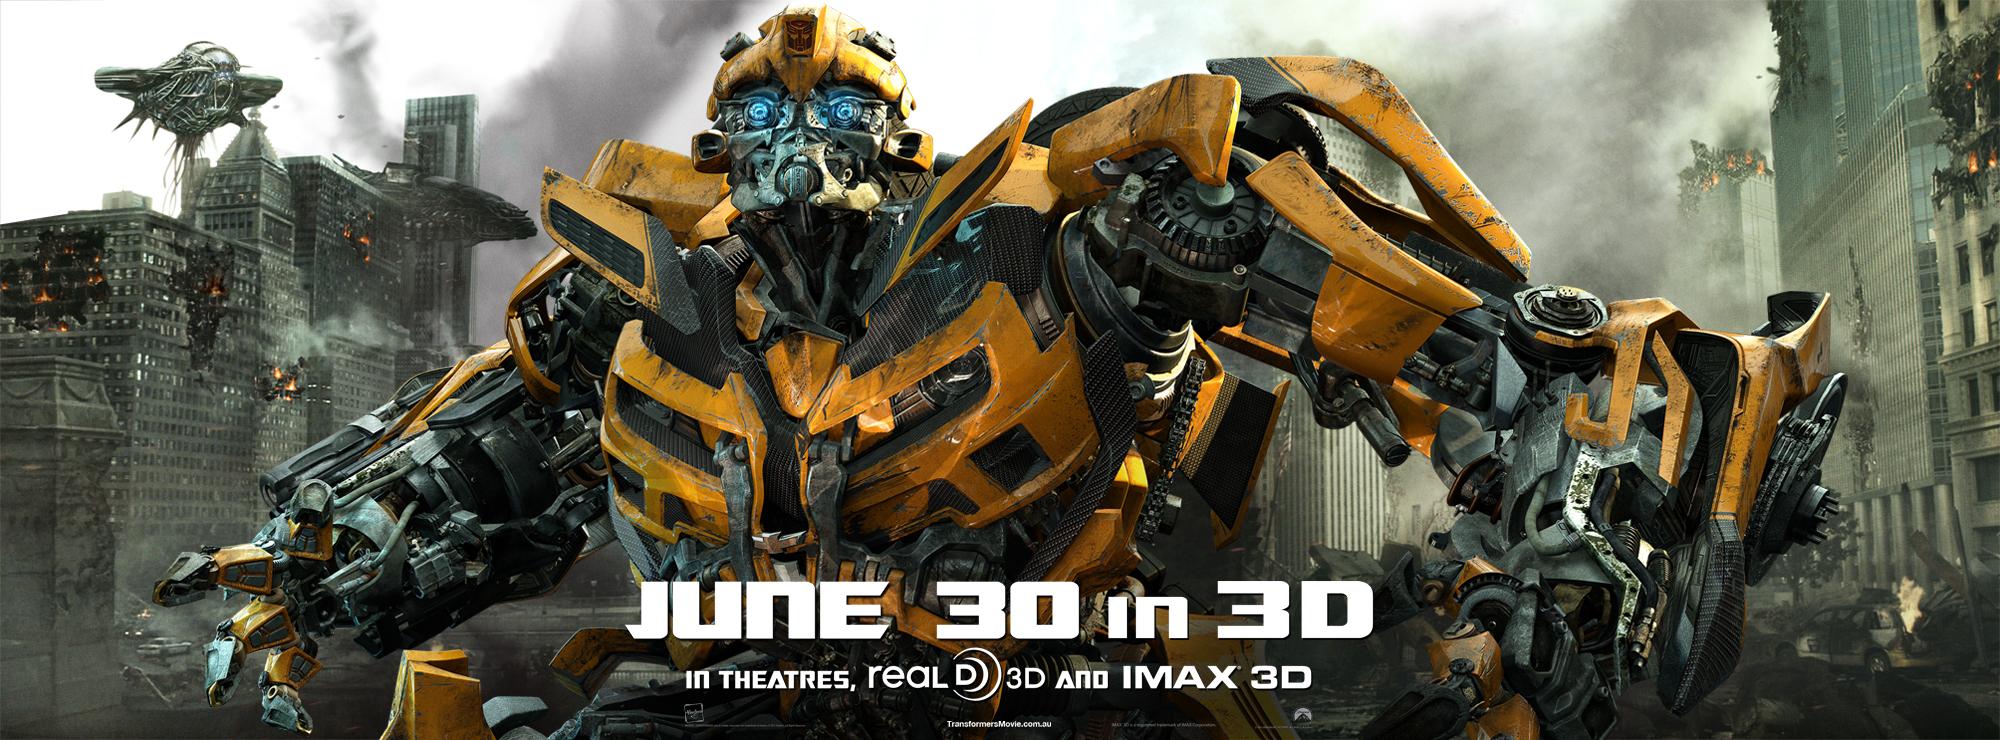 Transformers: Dark of the Moon - Bumblebee Banner